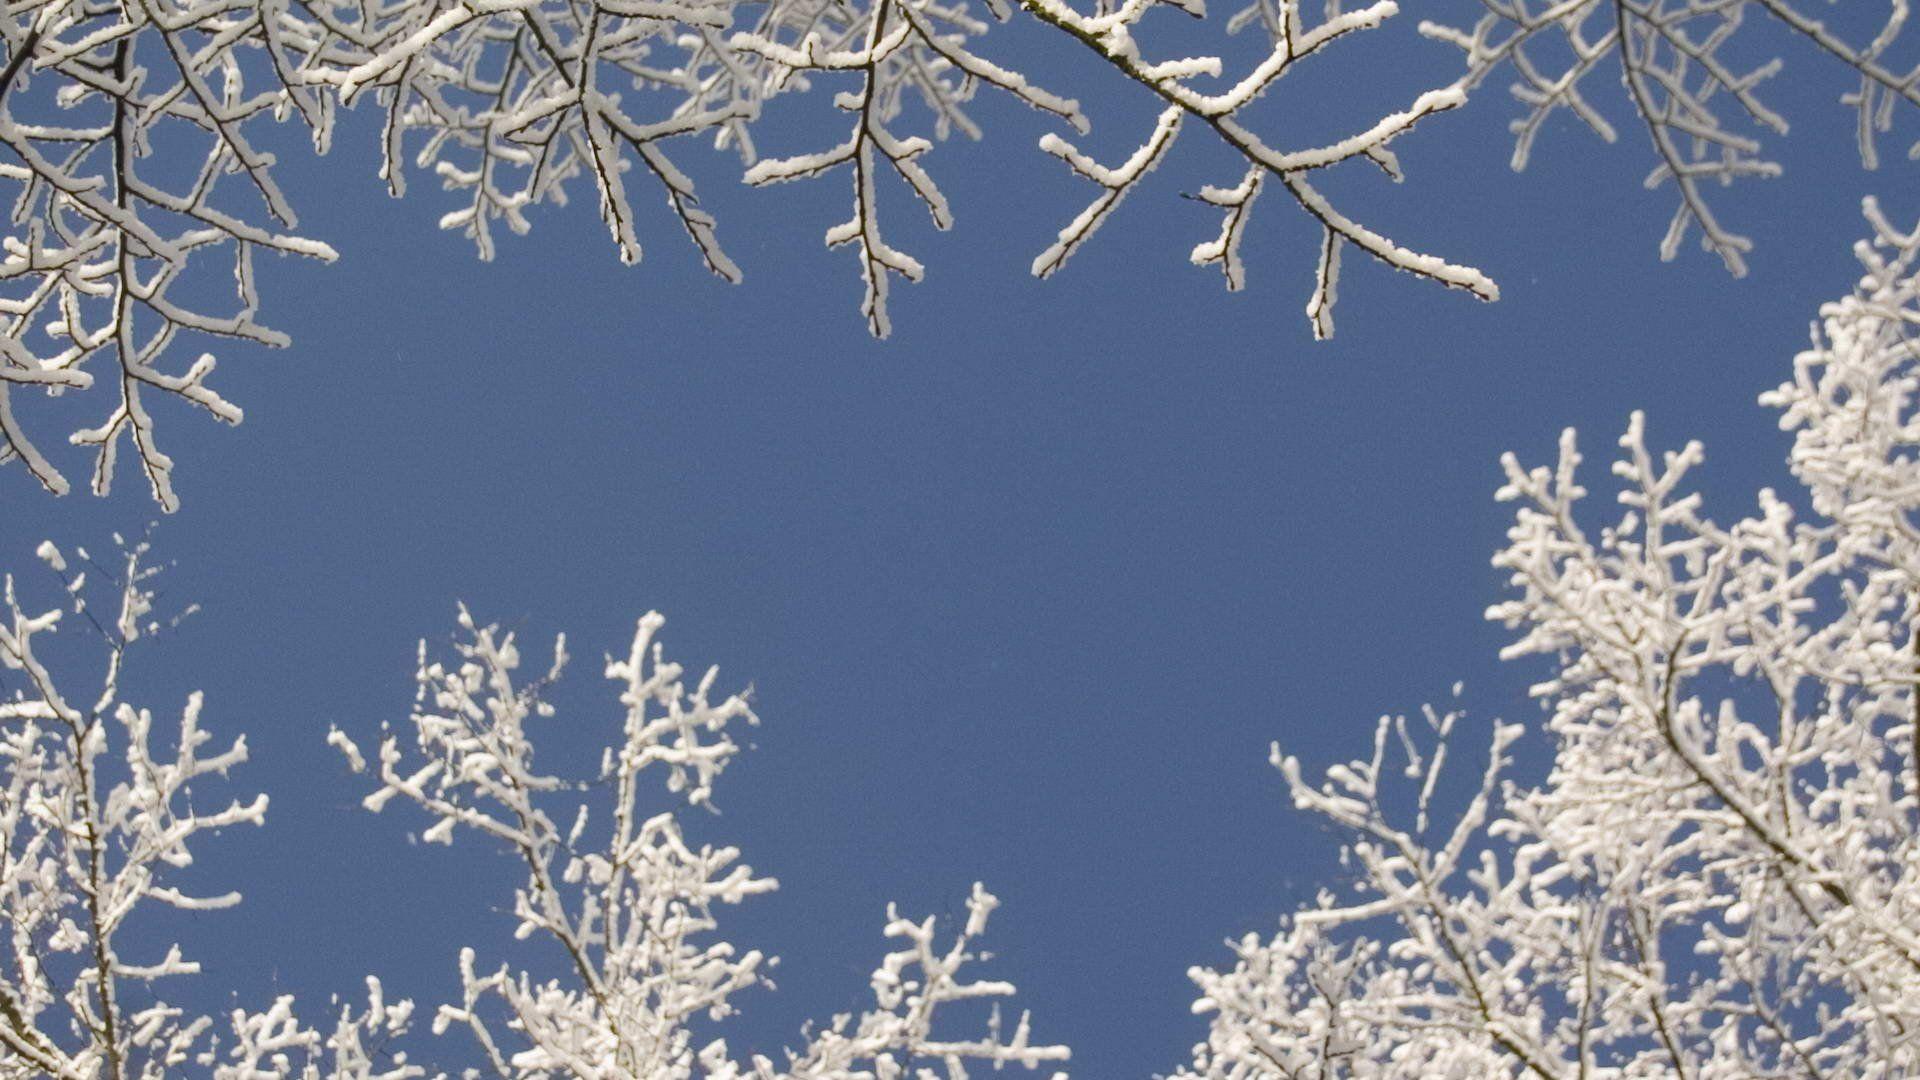 Winter Christmas Wallpaper For Desktops 1080x675 Wallpapers Desktop 50